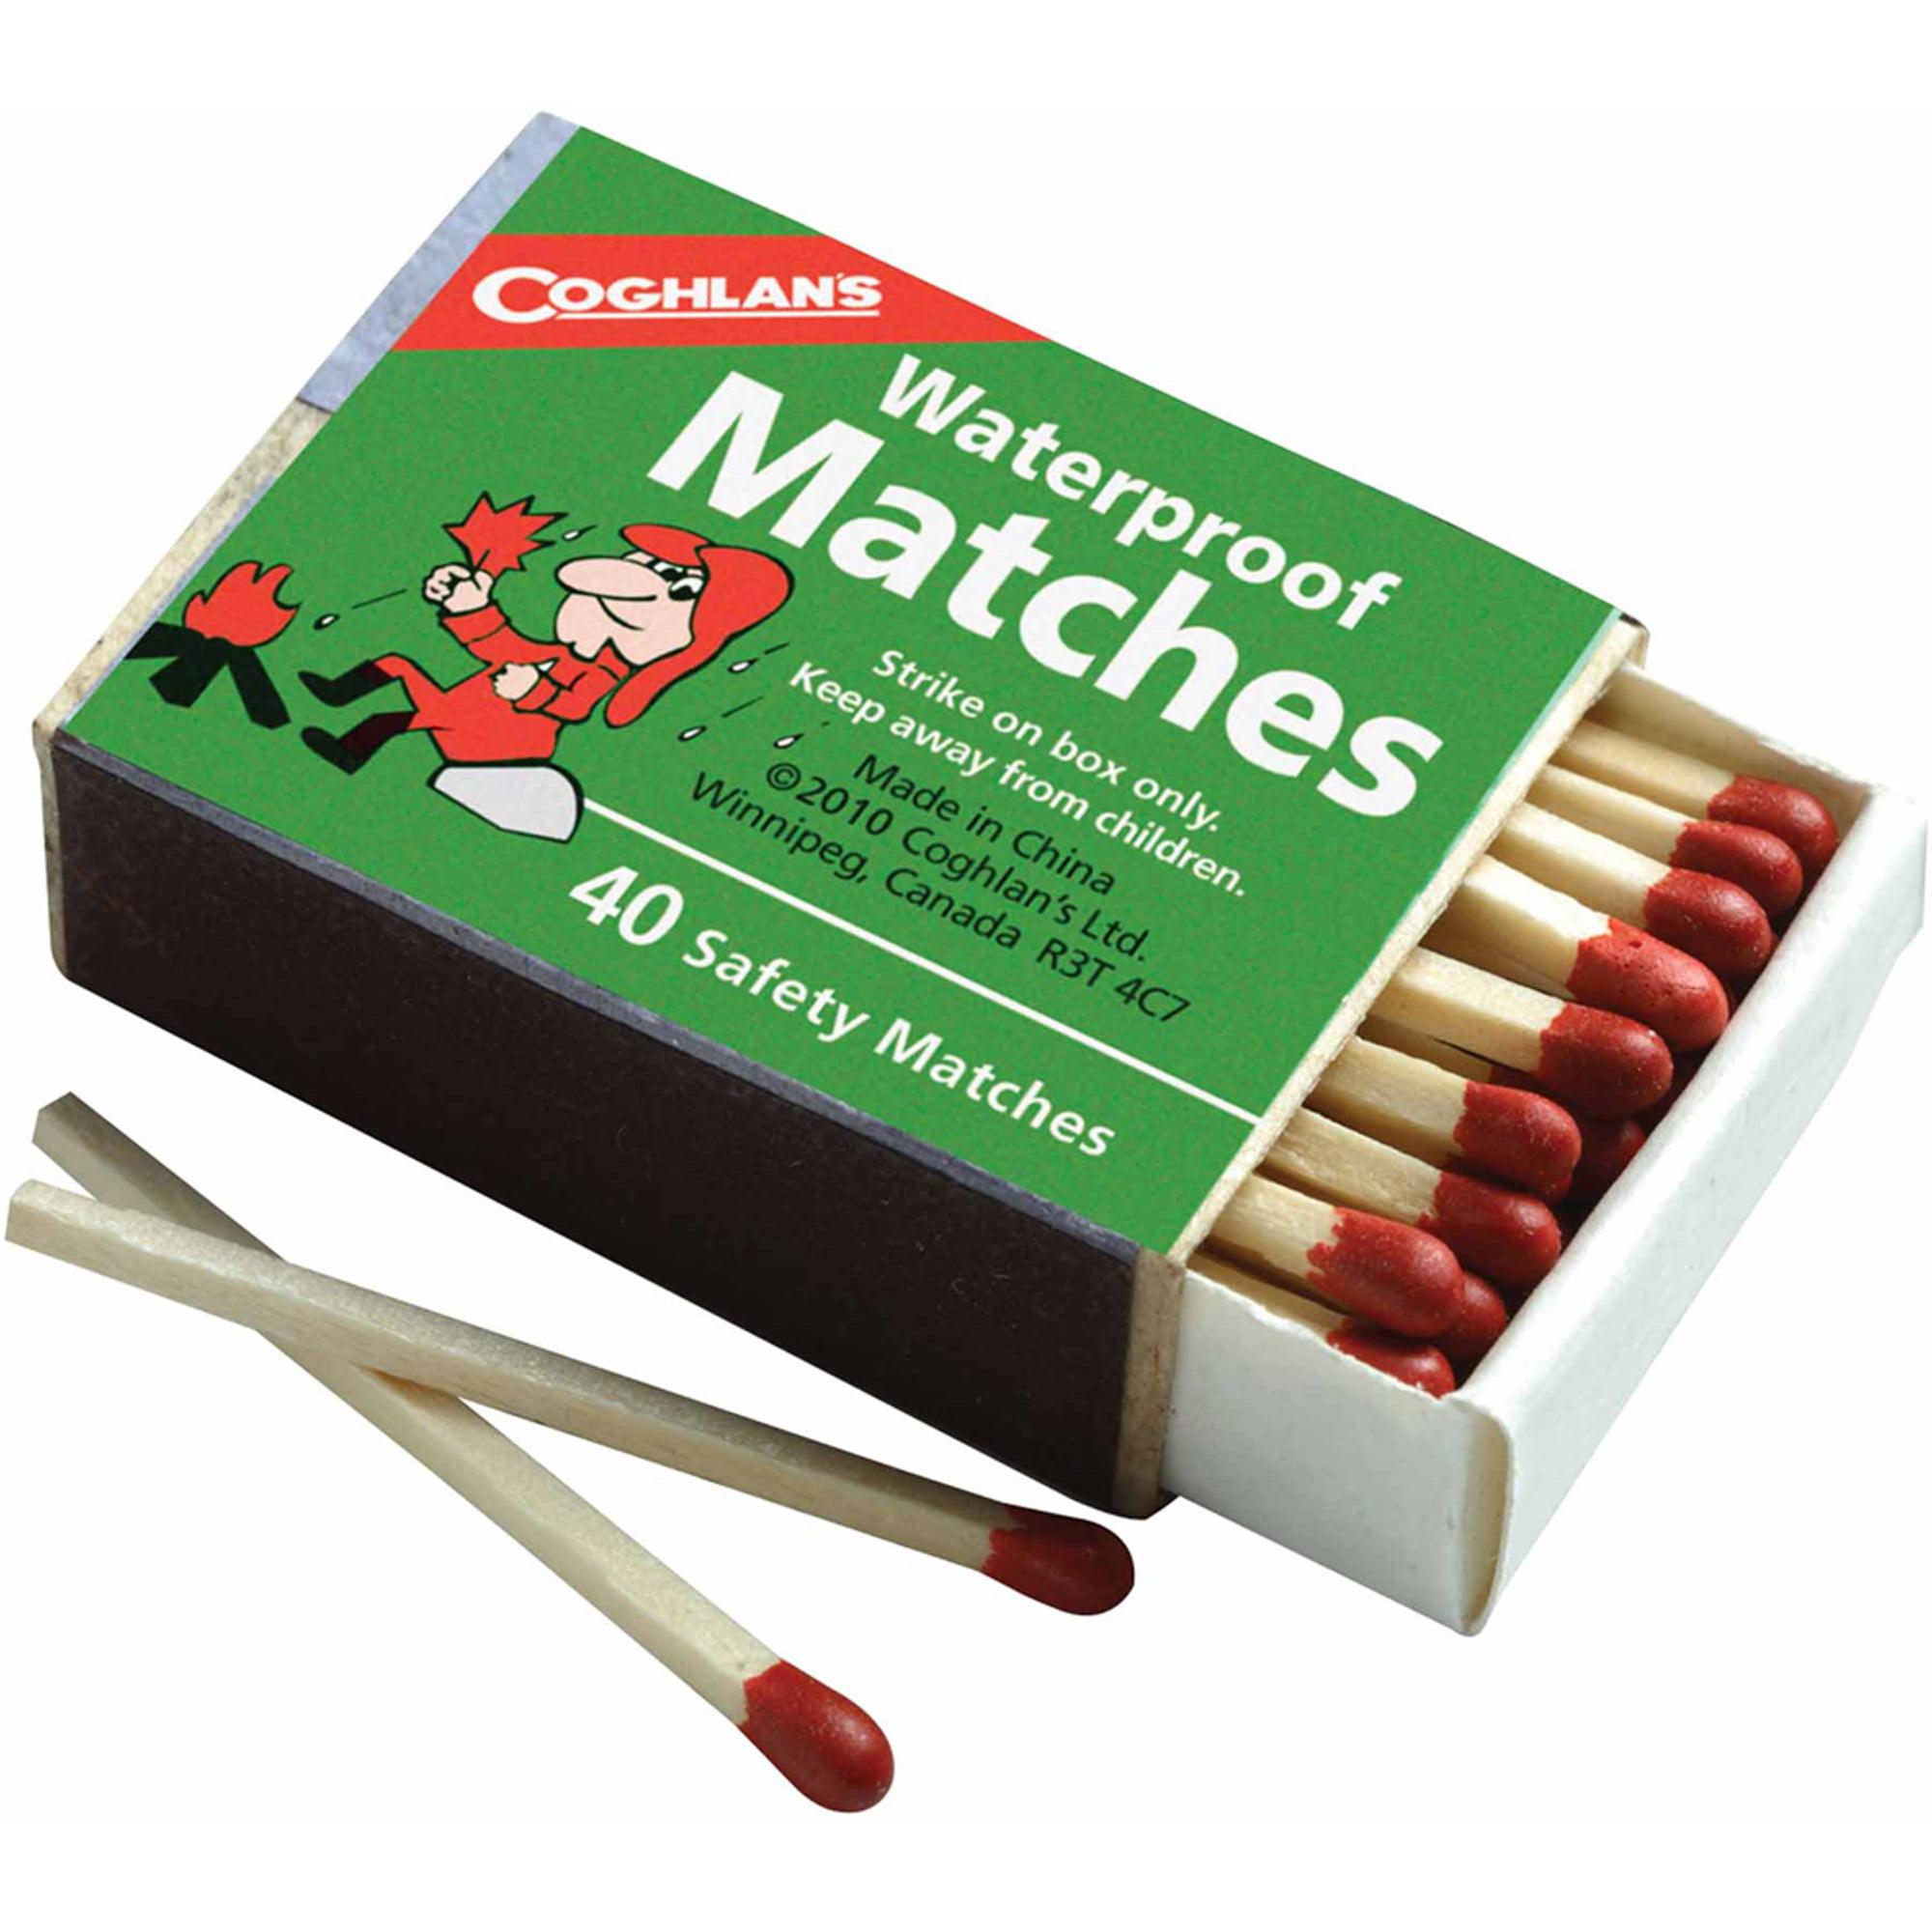 Coghlan's 940BP Waterproof Matches, 4pk